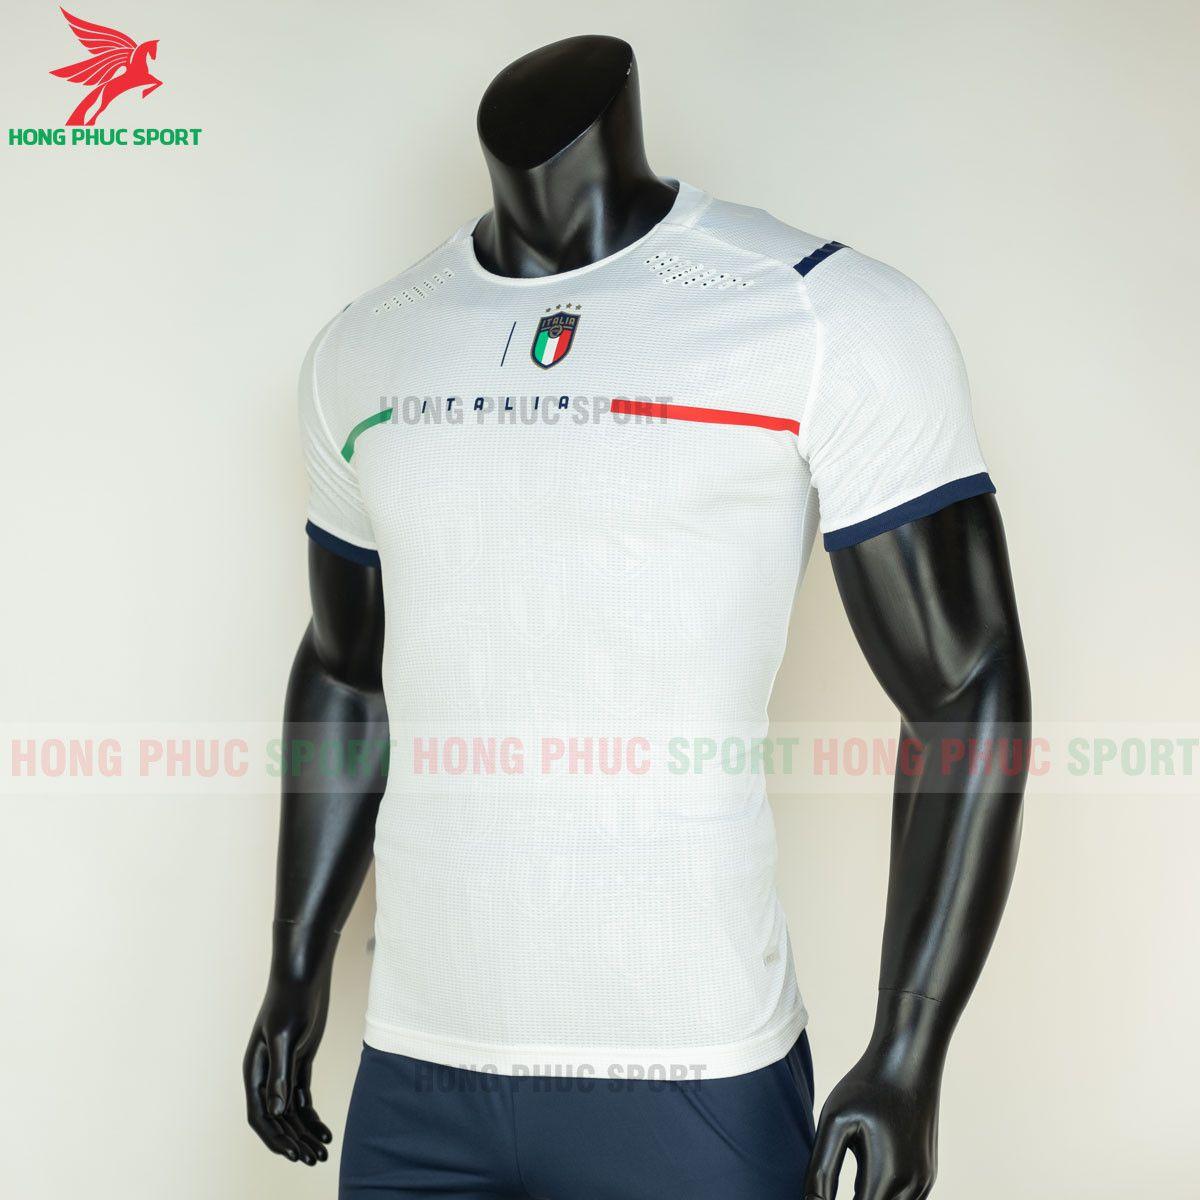 https://cdn.hongphucsport.com/unsafe/s4.shopbay.vn/files/285/ao-bong-da-tuyen-italia-2021-san-khach-hang-thai-3-60d2fefa8dd3a.jpg